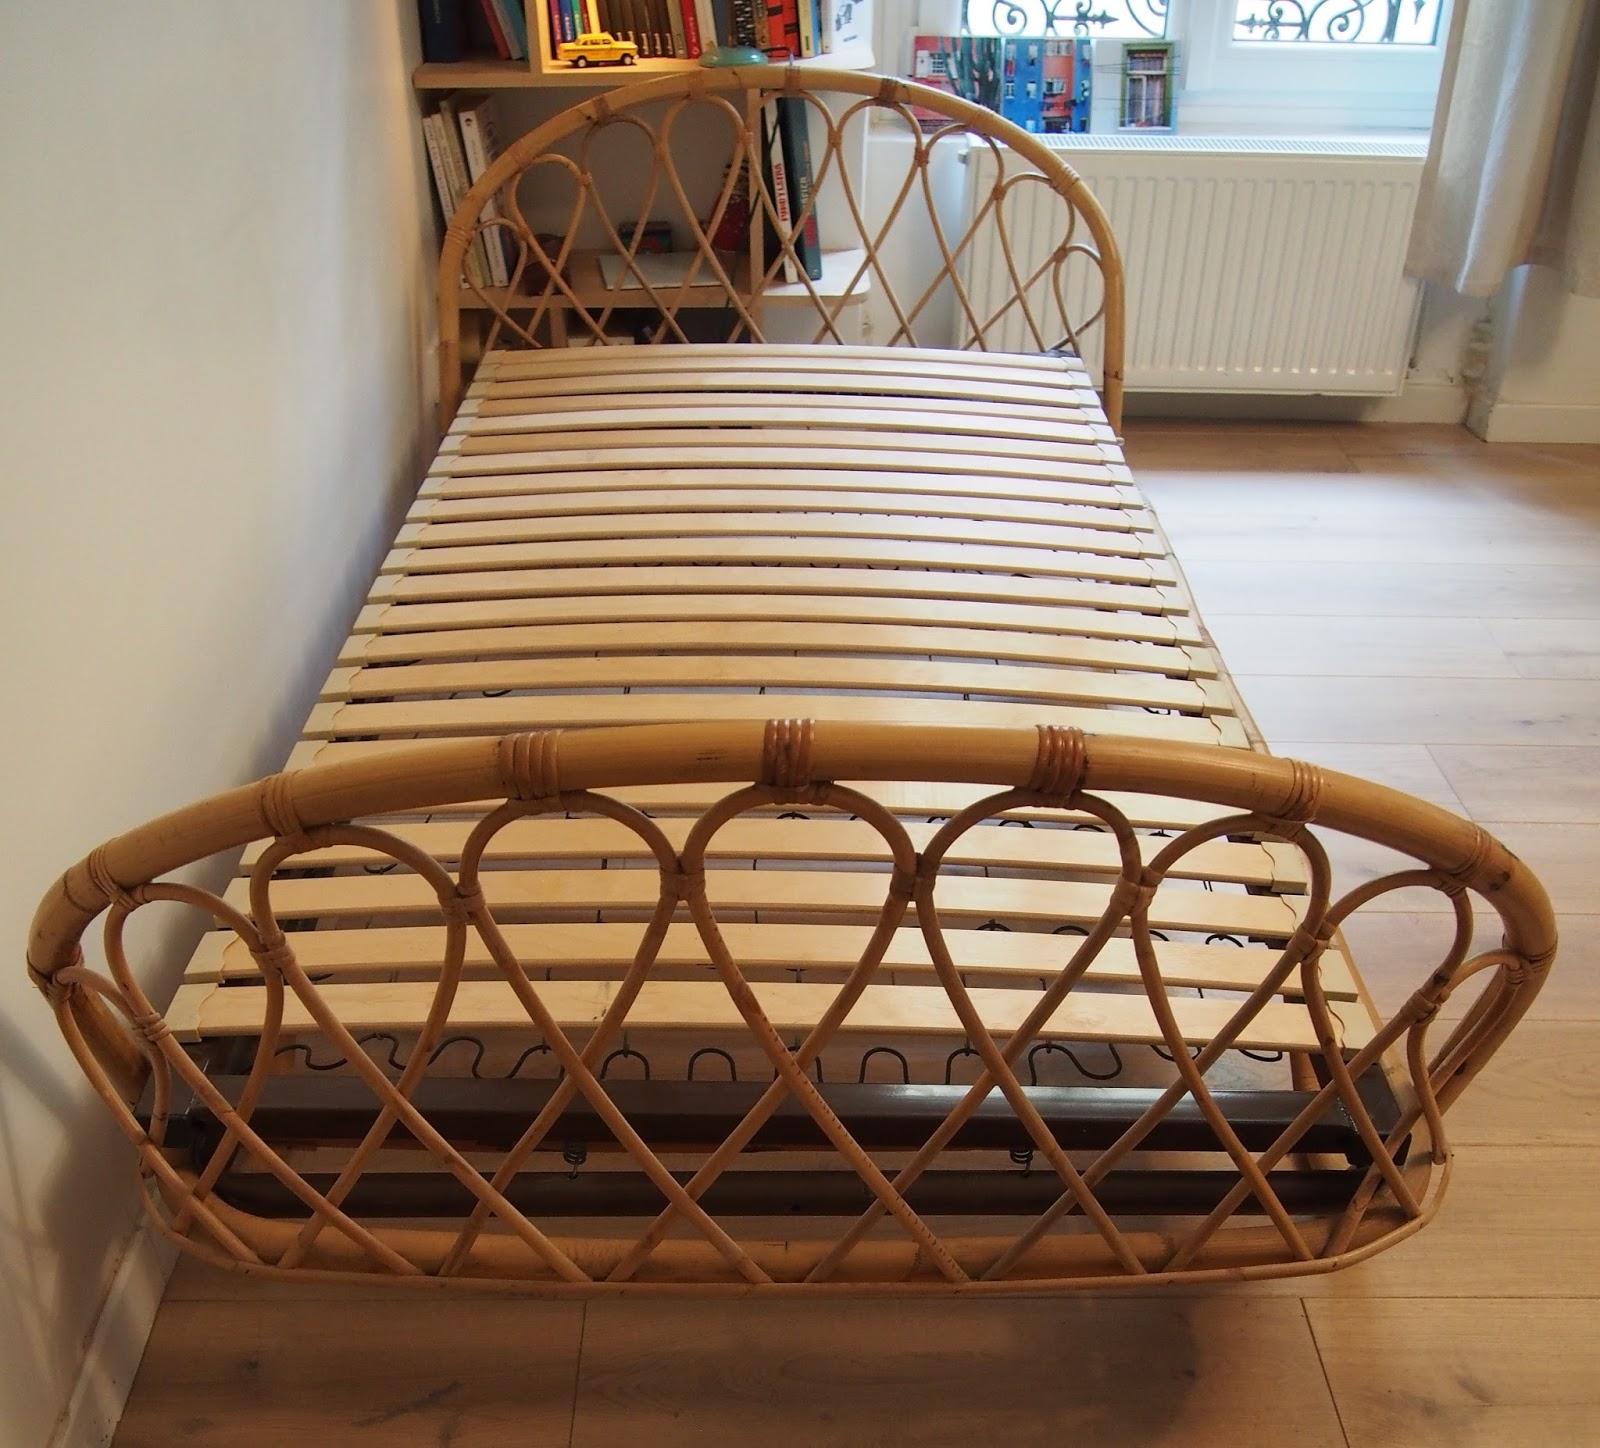 lit en rotin haute qualit rotin vritable lit rotin art lit double lits rotin lit rotin lit. Black Bedroom Furniture Sets. Home Design Ideas